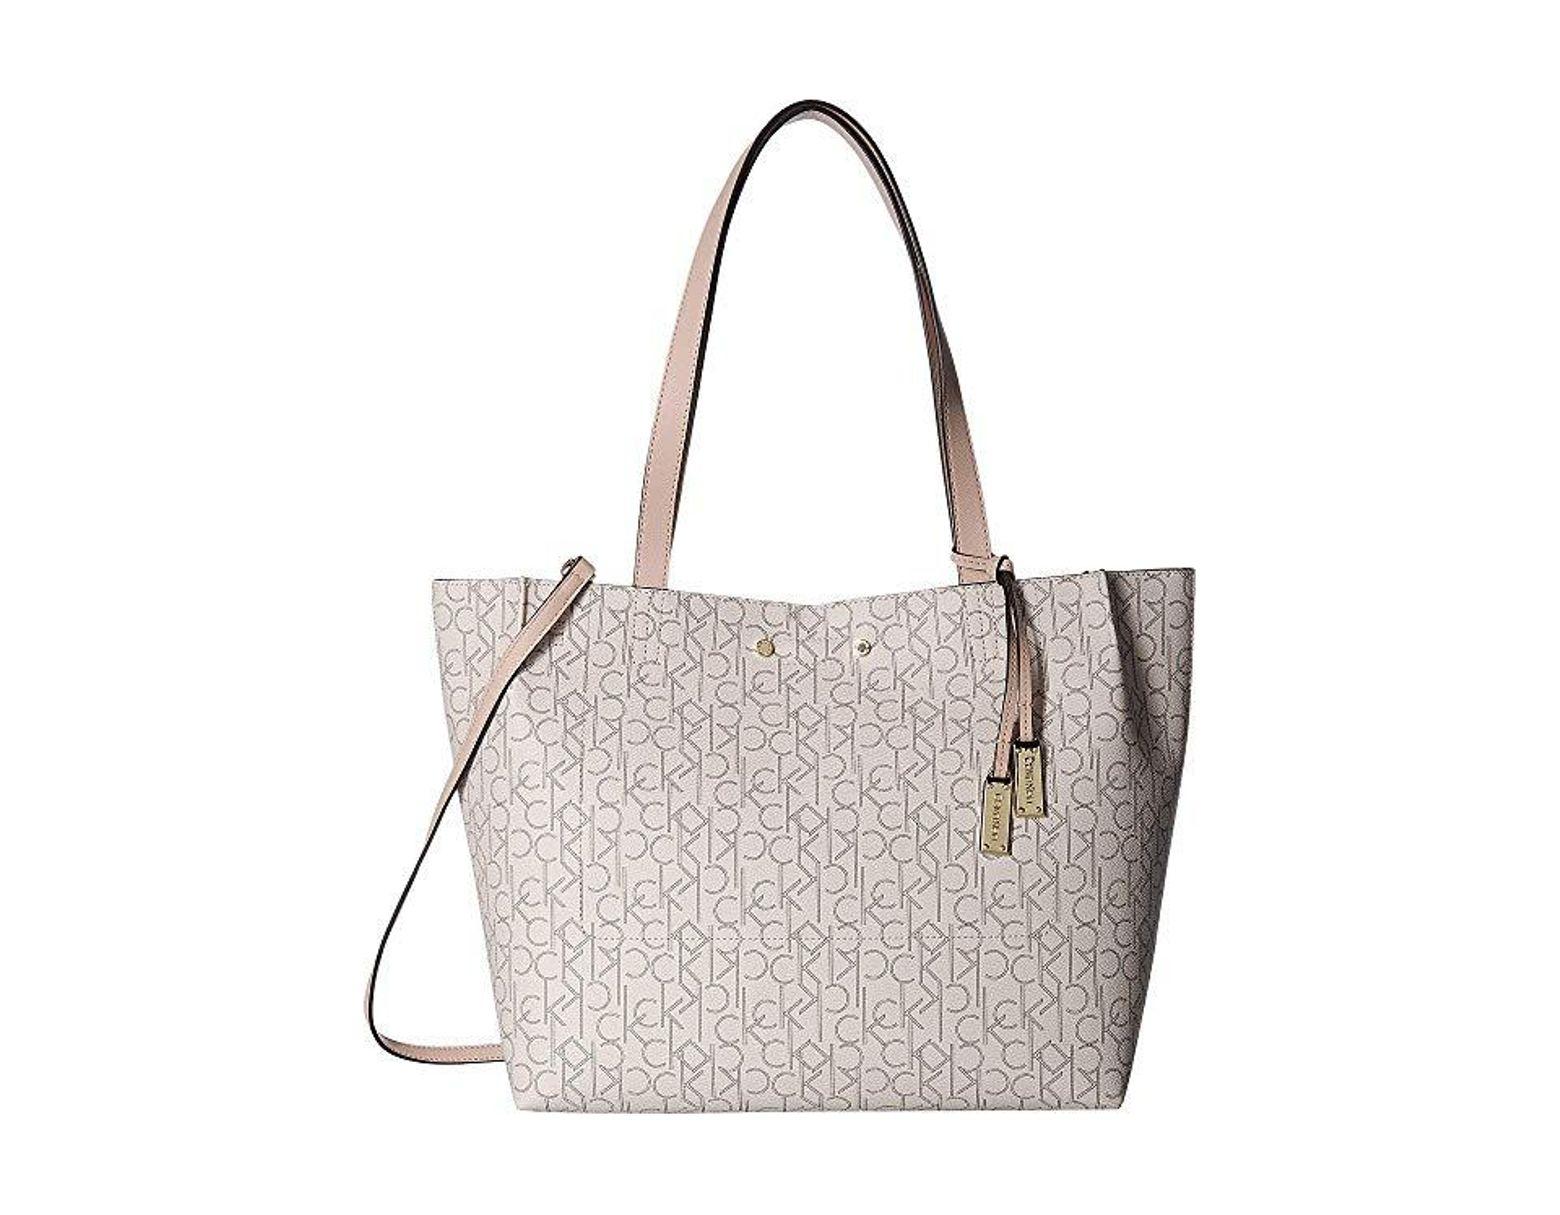 dd208516bd Calvin Klein Monogram Tote (almond/khaki/desert Taupe) Tote Handbags in  Natural - Lyst